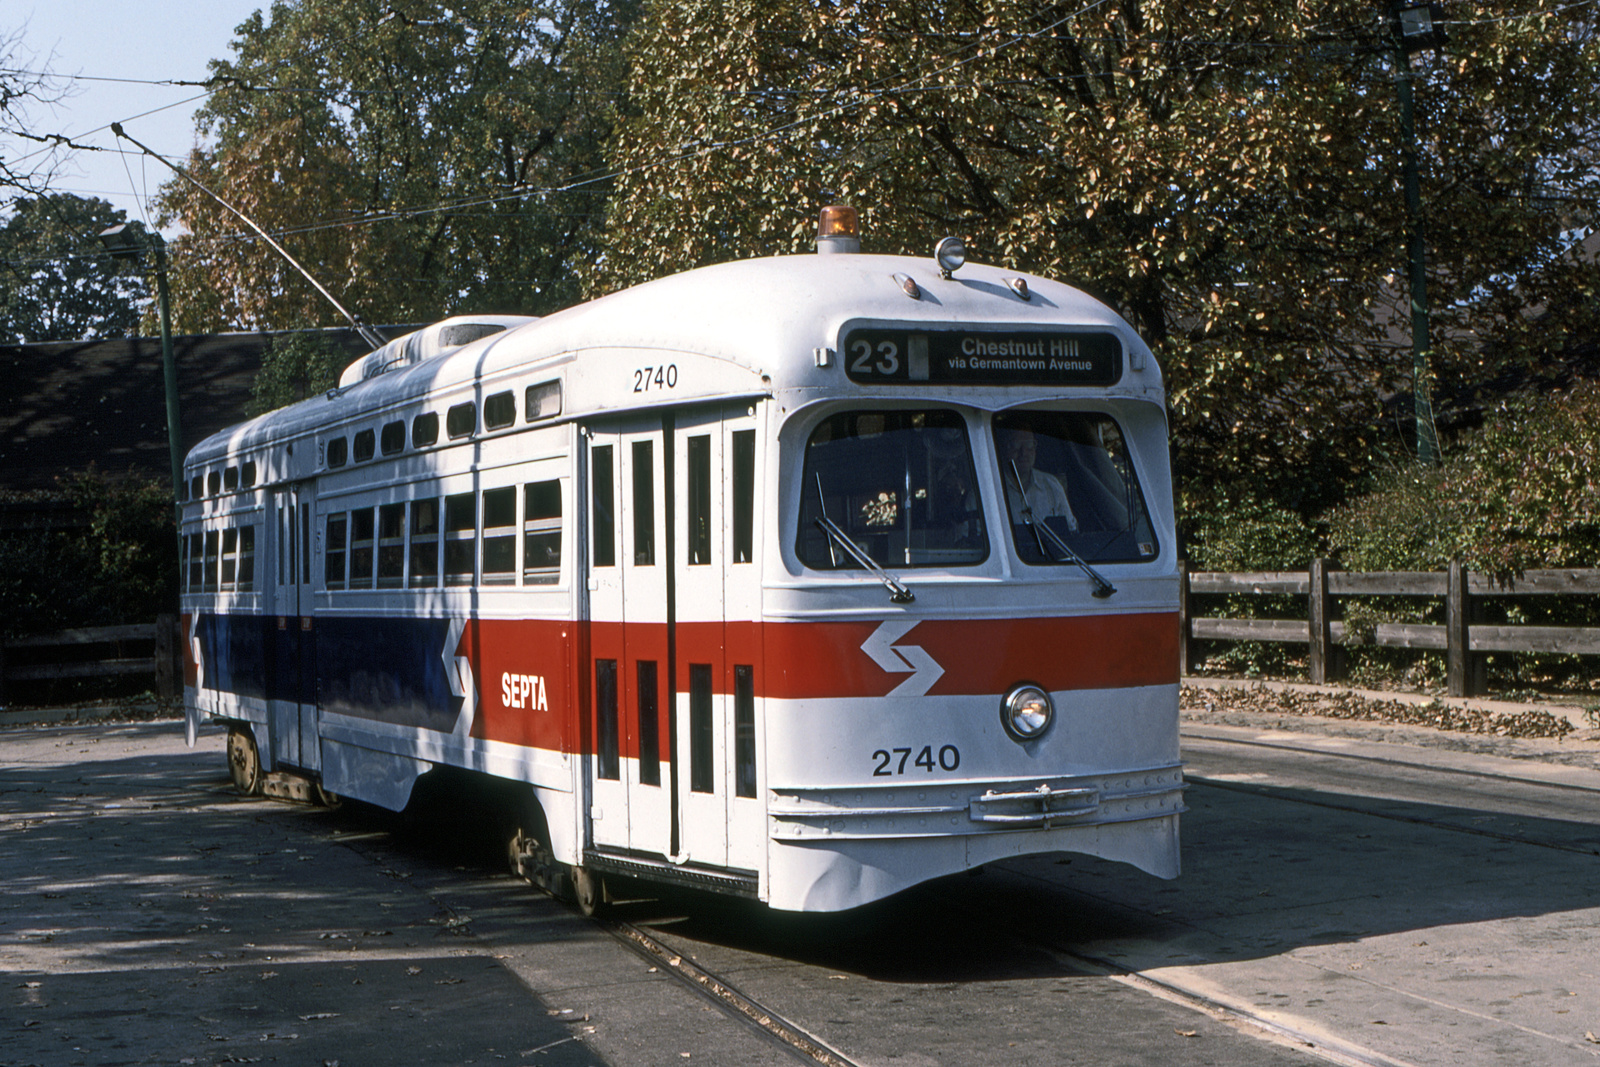 (989k, 1600x1067)<br><b>Country:</b> United States<br><b>City:</b> Philadelphia, PA<br><b>System:</b> SEPTA (or Predecessor)<br><b>Line:</b> Rt. 23-Germantown<br><b>Location:</b> Bethlehem Pike/Chestnut Hill Loop<br><b>Car:</b> PTC/SEPTA Postwar All-electric PCC (St.Louis, 1947) 2740 <br><b>Collection of:</b> David Pirmann<br><b>Date:</b> 10/15/1989<br><b>Viewed (this week/total):</b> 0 / 72